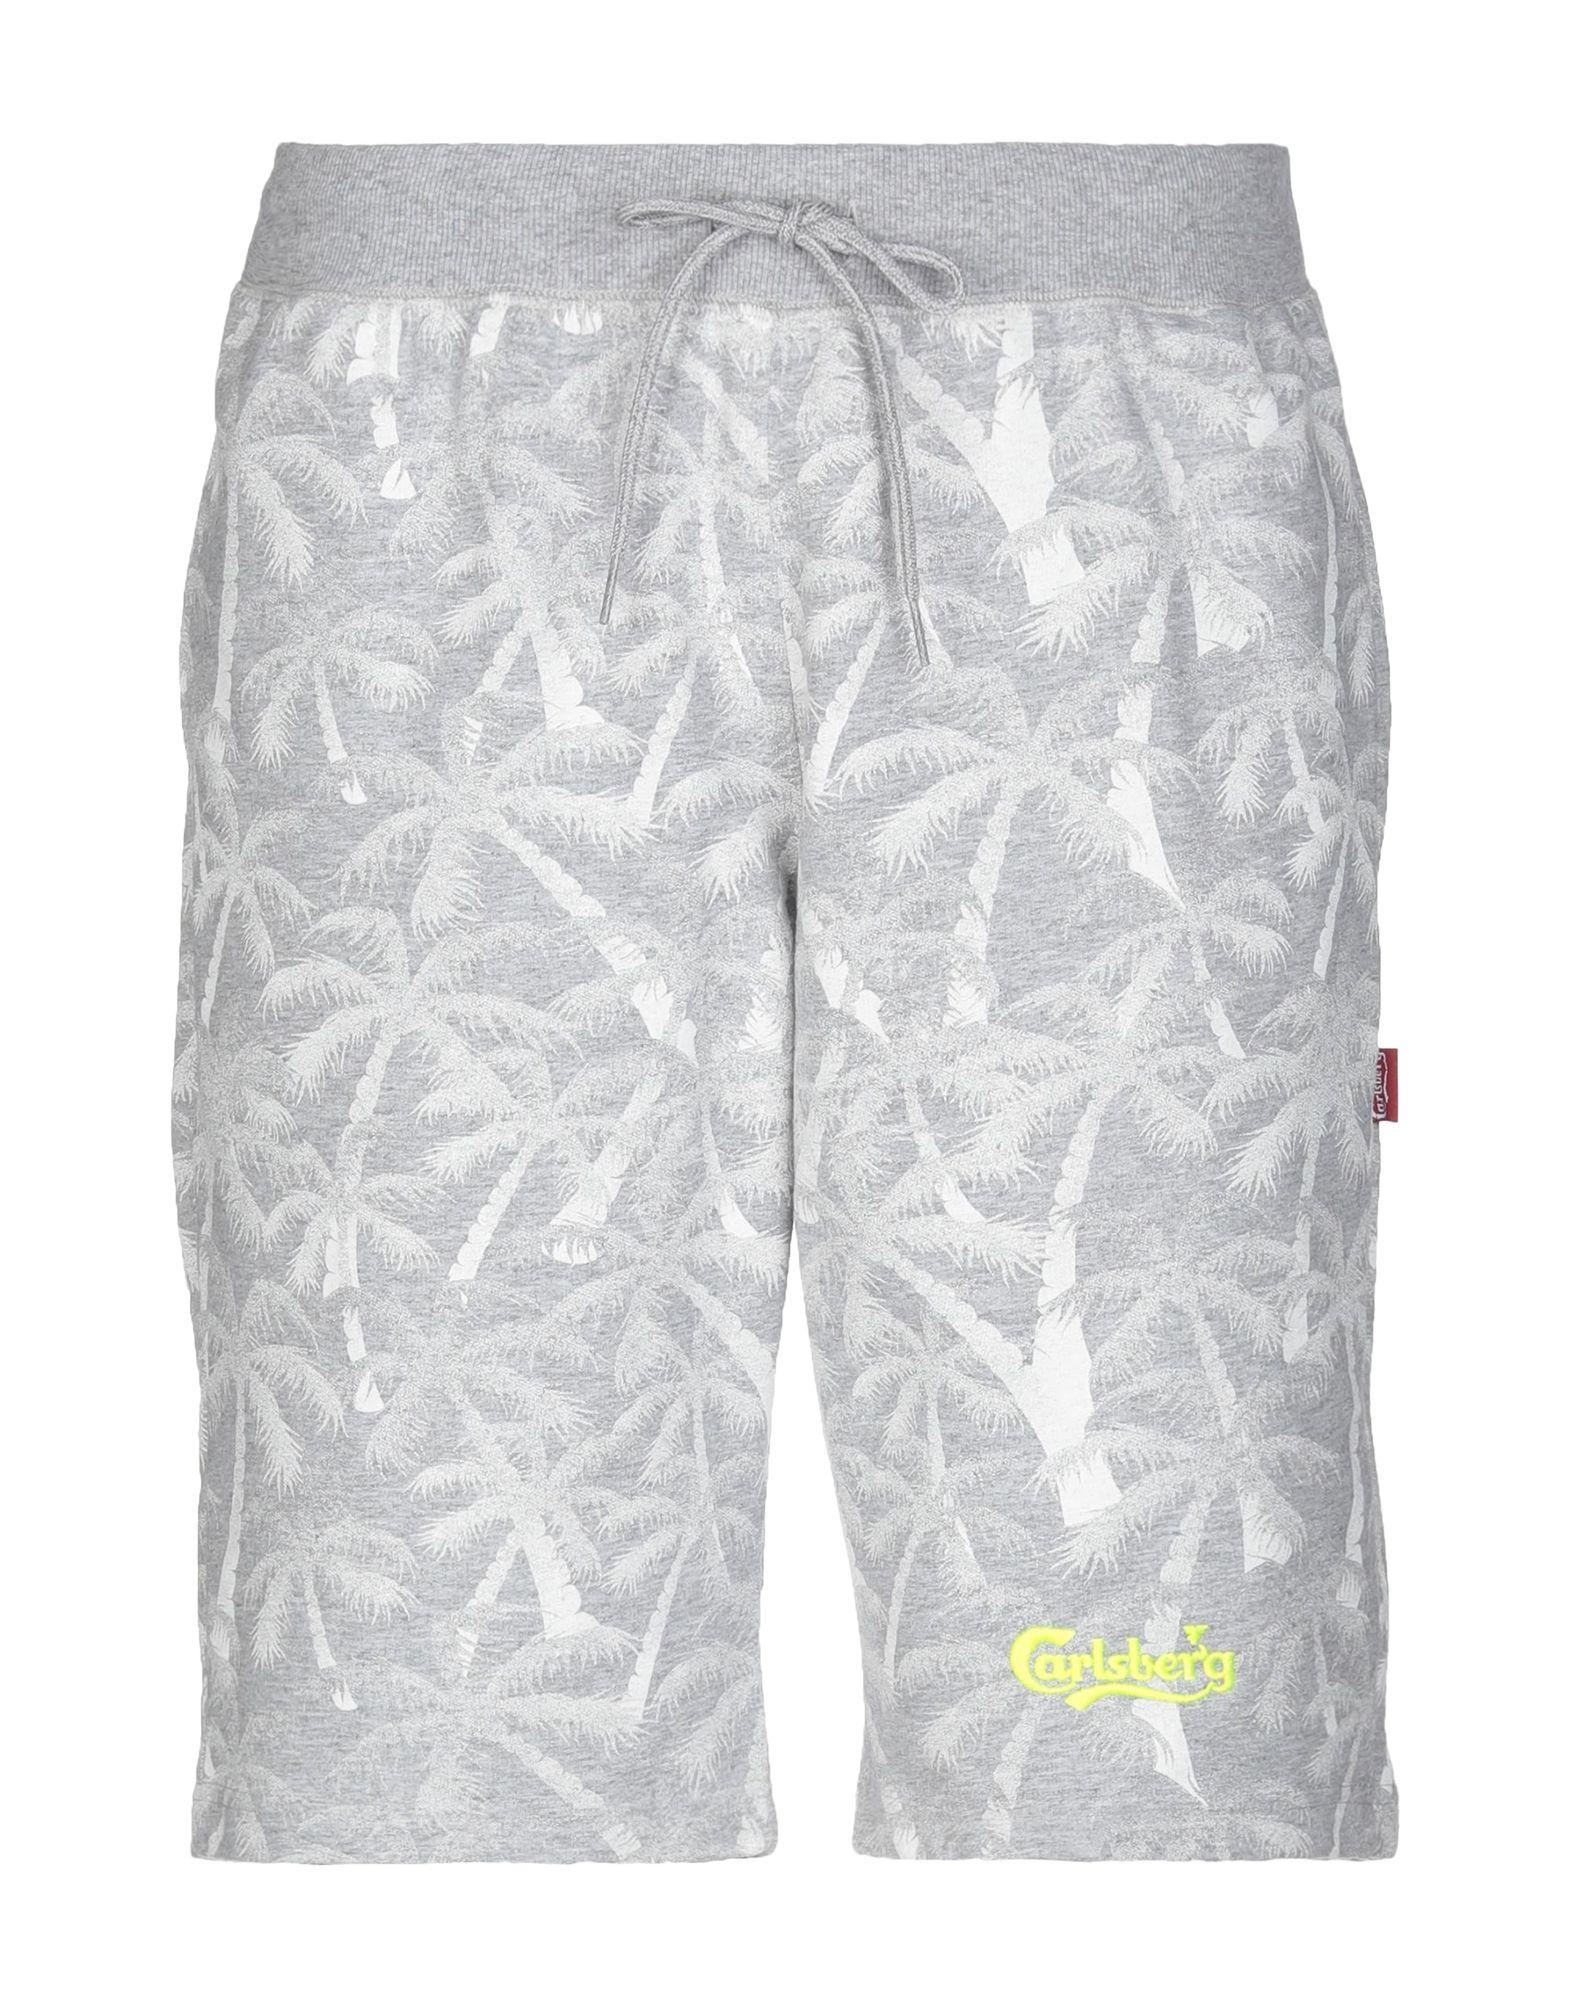 Pantalone Felpa Carlsberg uomo - - 13273191MN